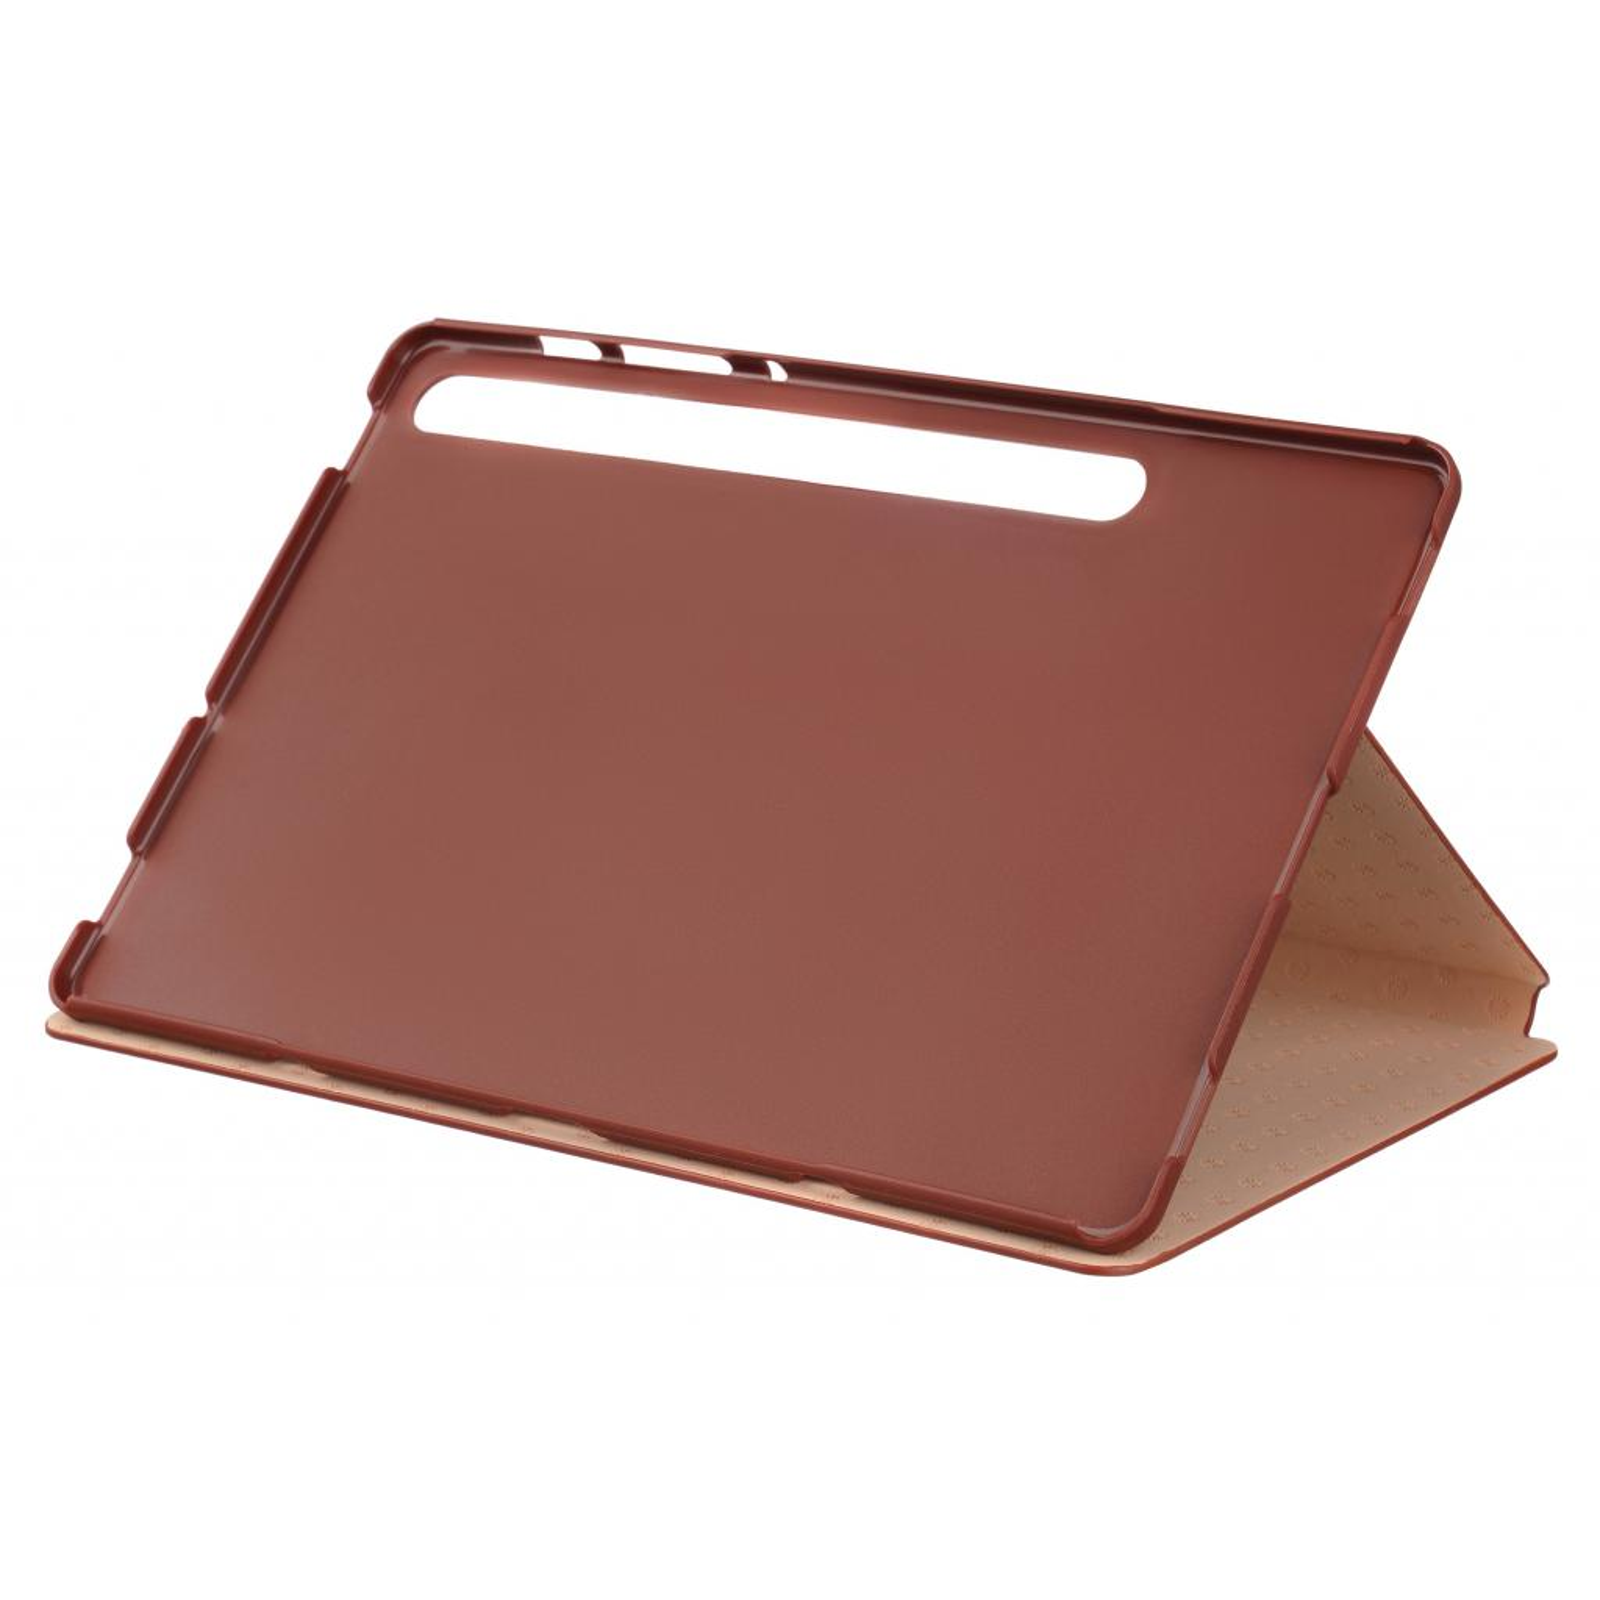 Чохол до планшета 2E Samsung Galaxy Tab S6, Retro, Brown (2E-G-S6-IKRT-BR) зображення 4